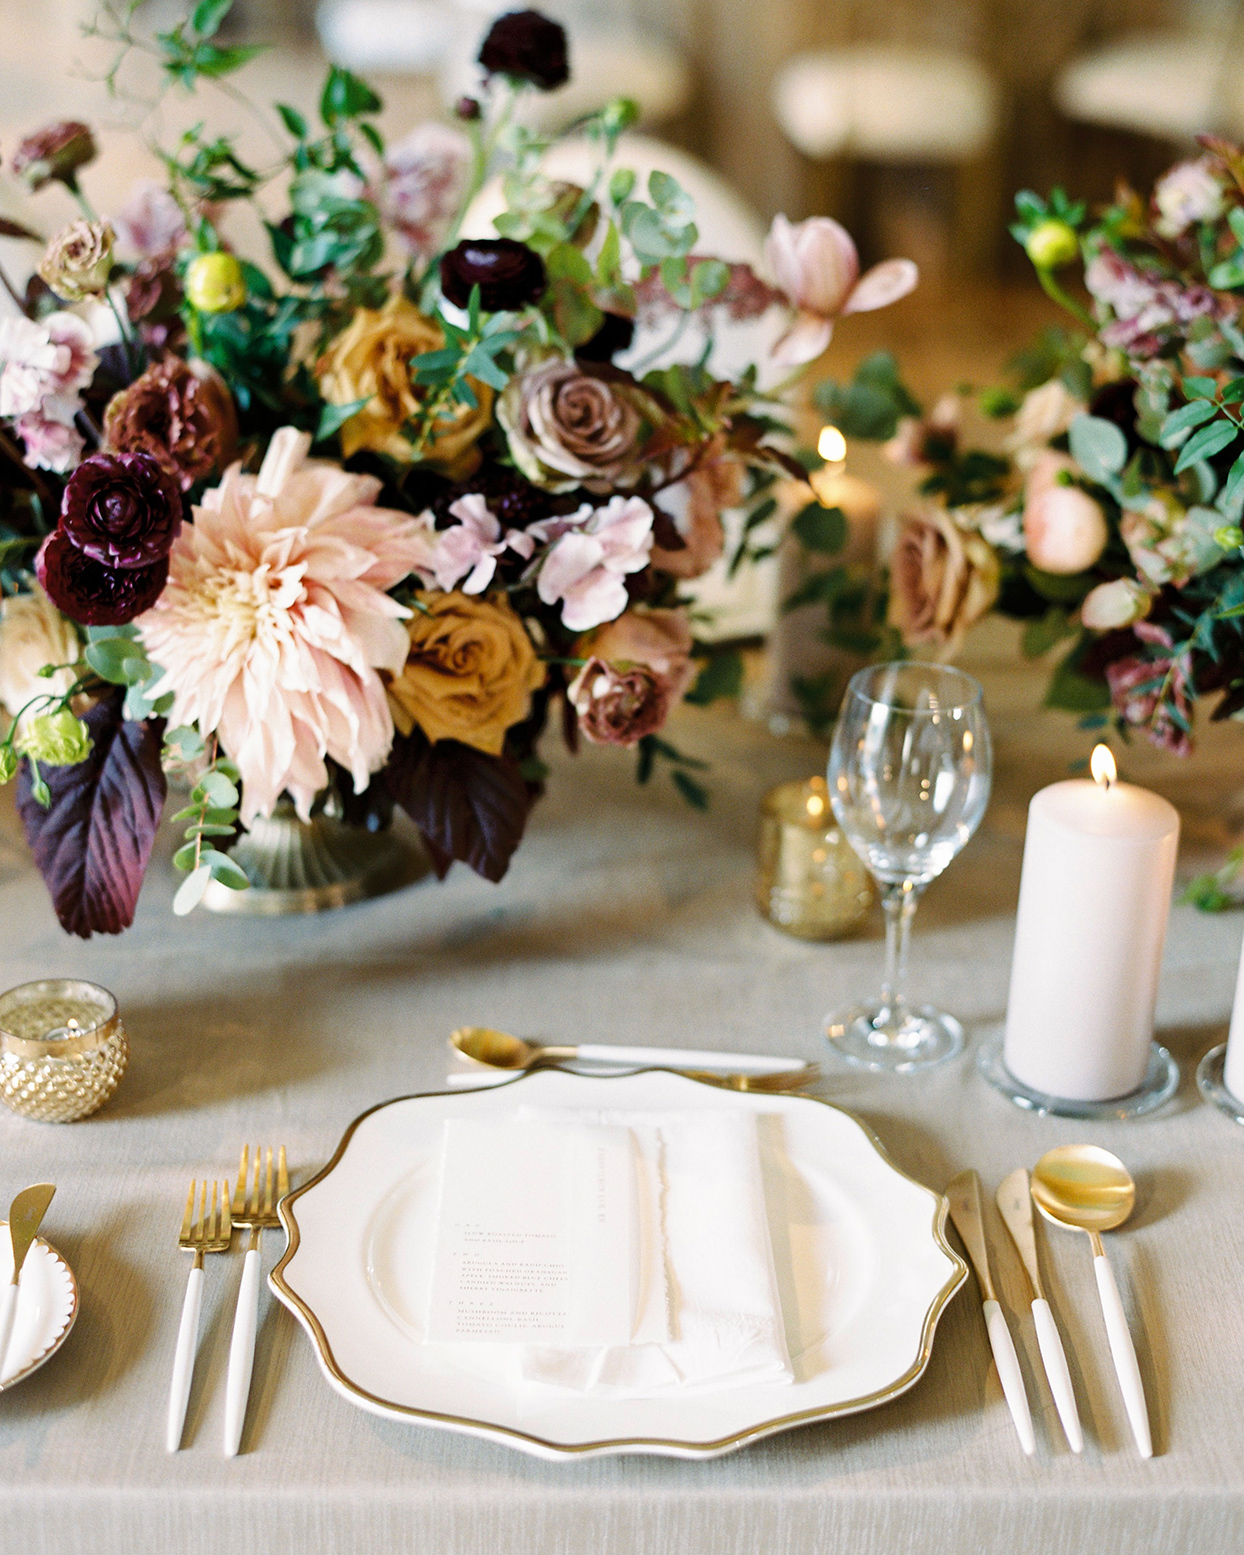 katie nicholas wedding elegant gold and white place setting